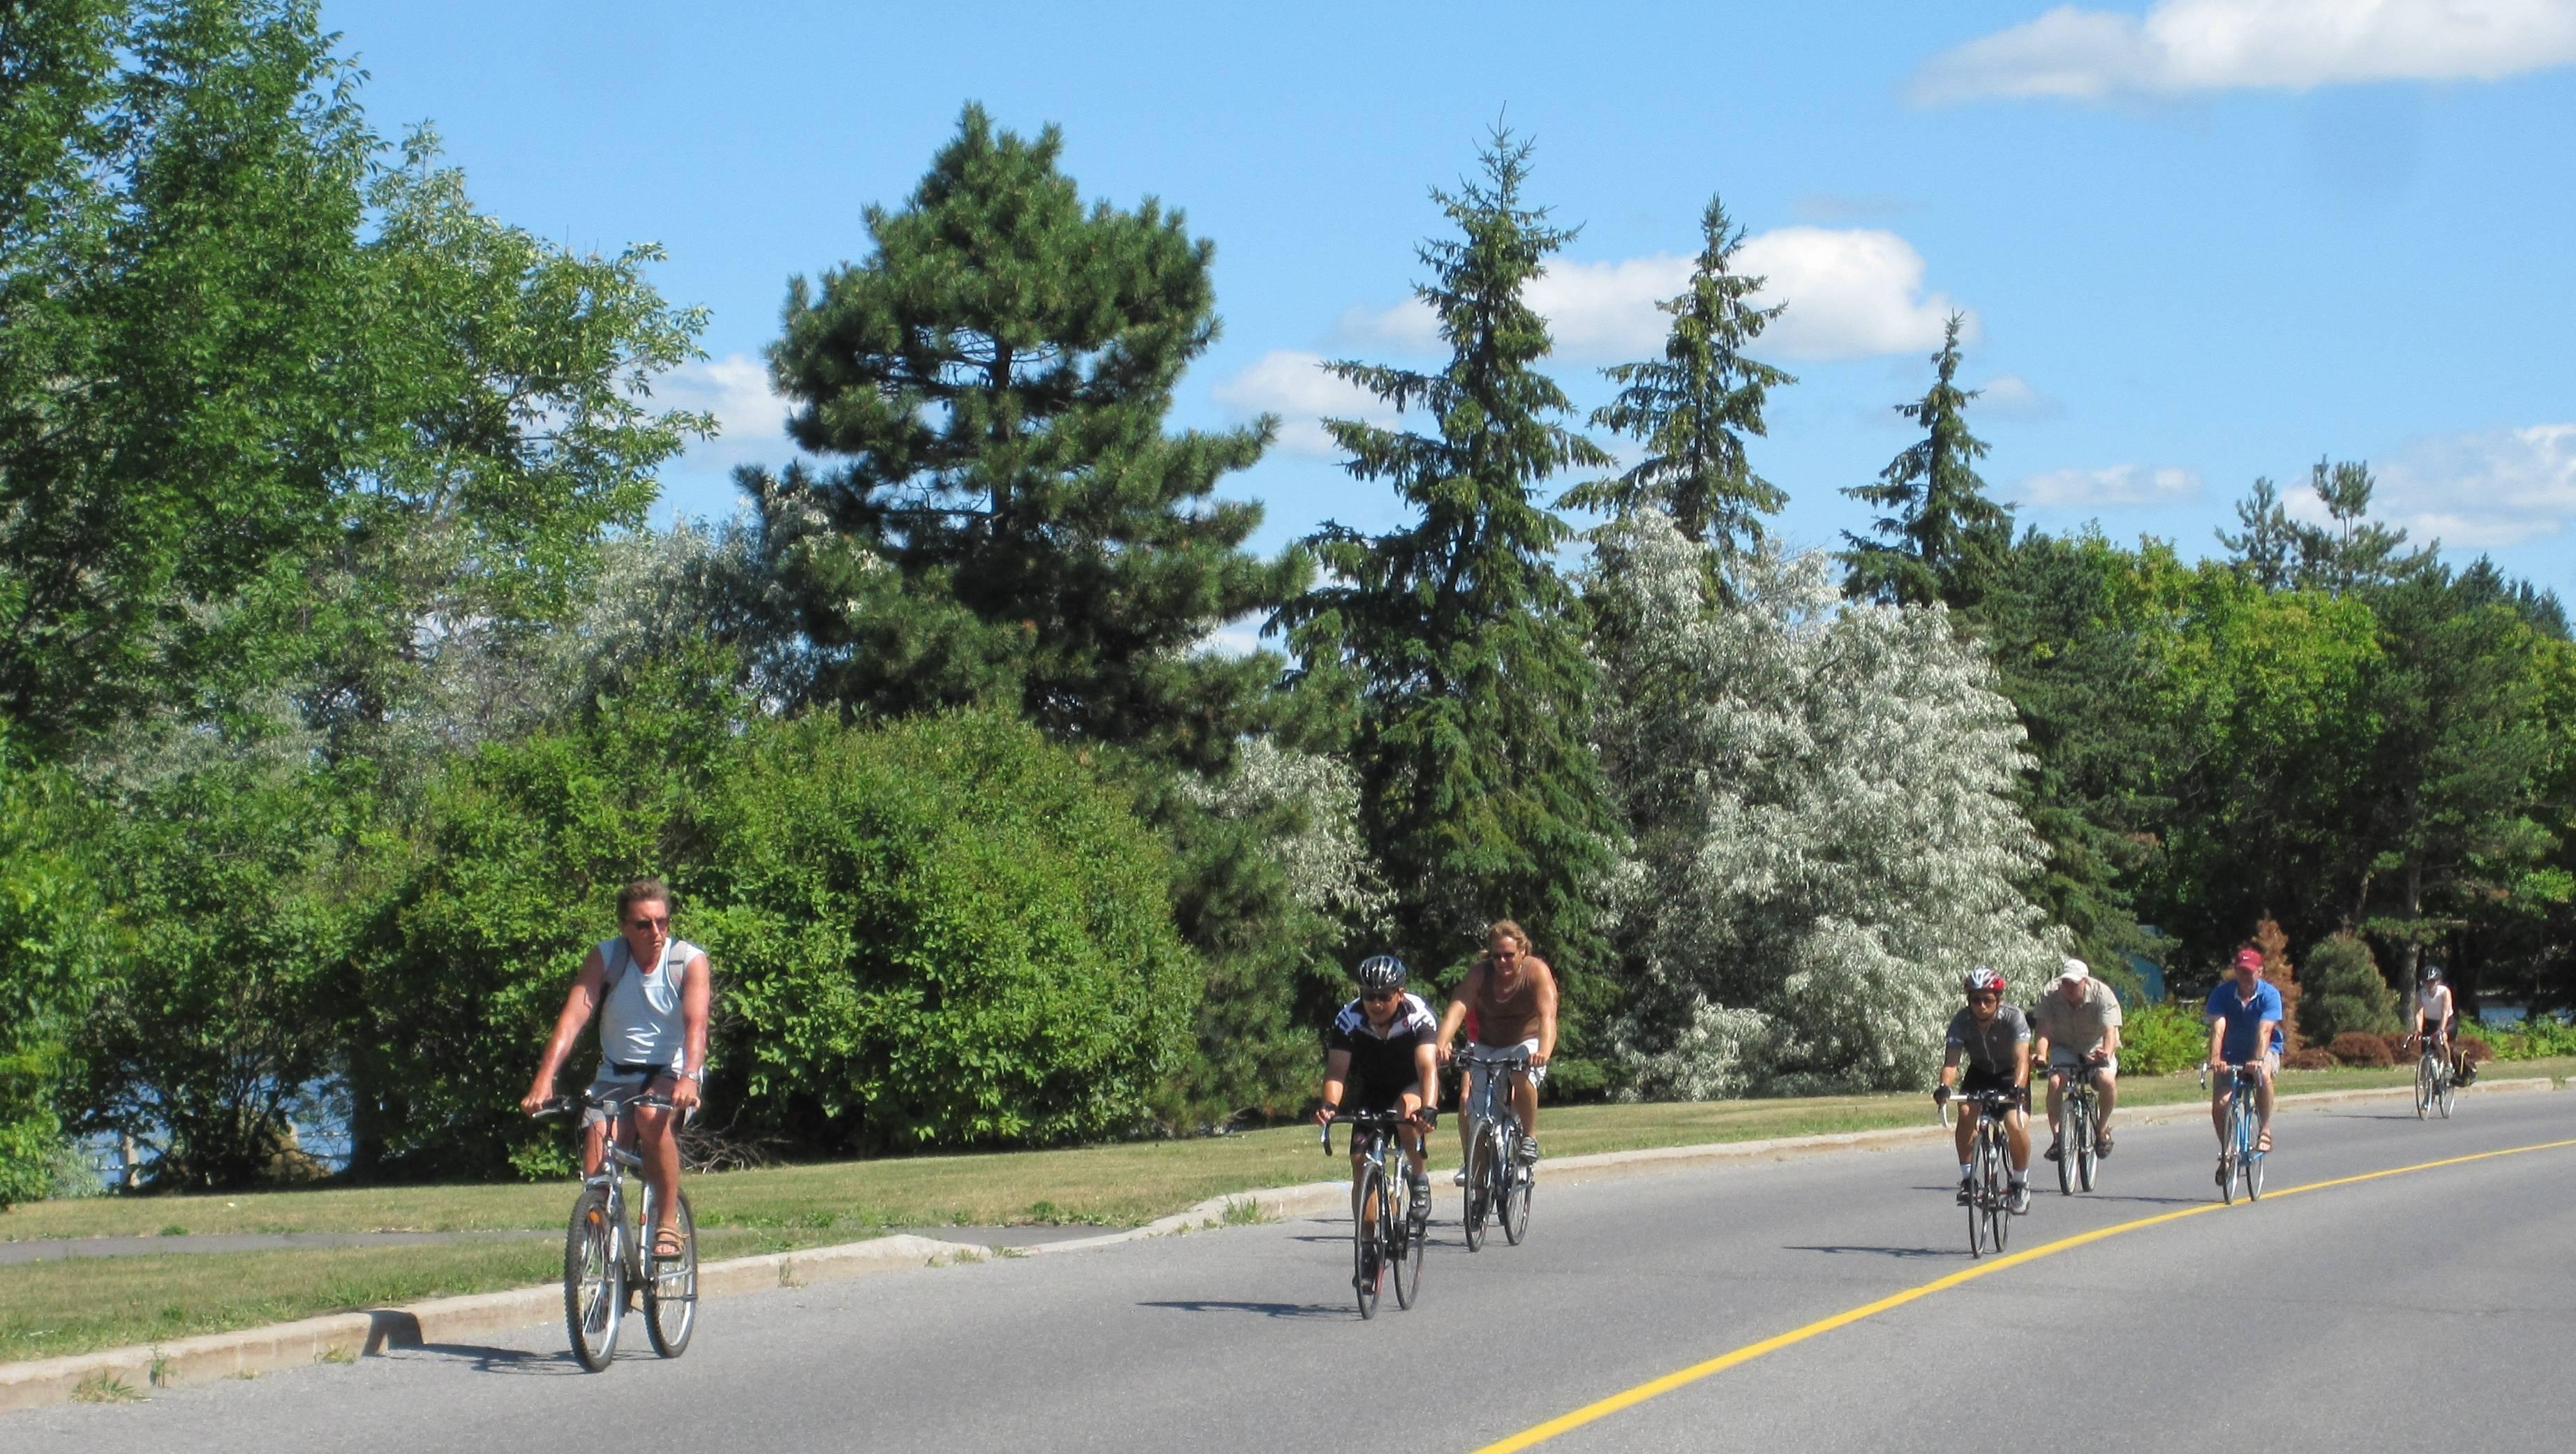 2011-07-24-ottawa-bicycle-culture-8